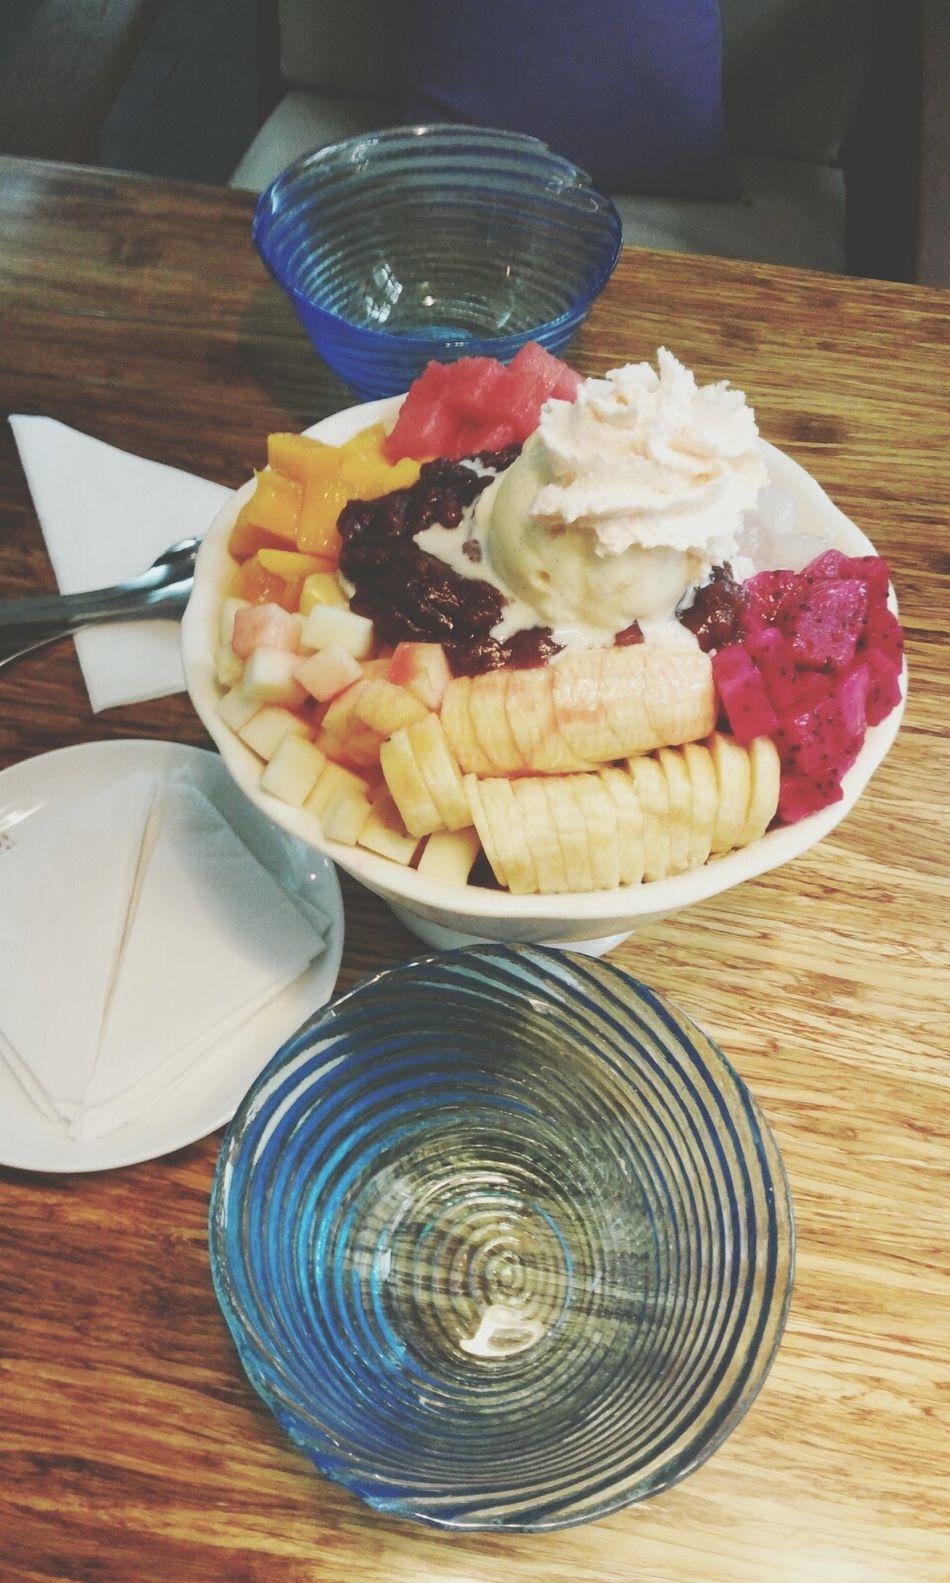 eating ice cream in Korean style Eating Ice Cream